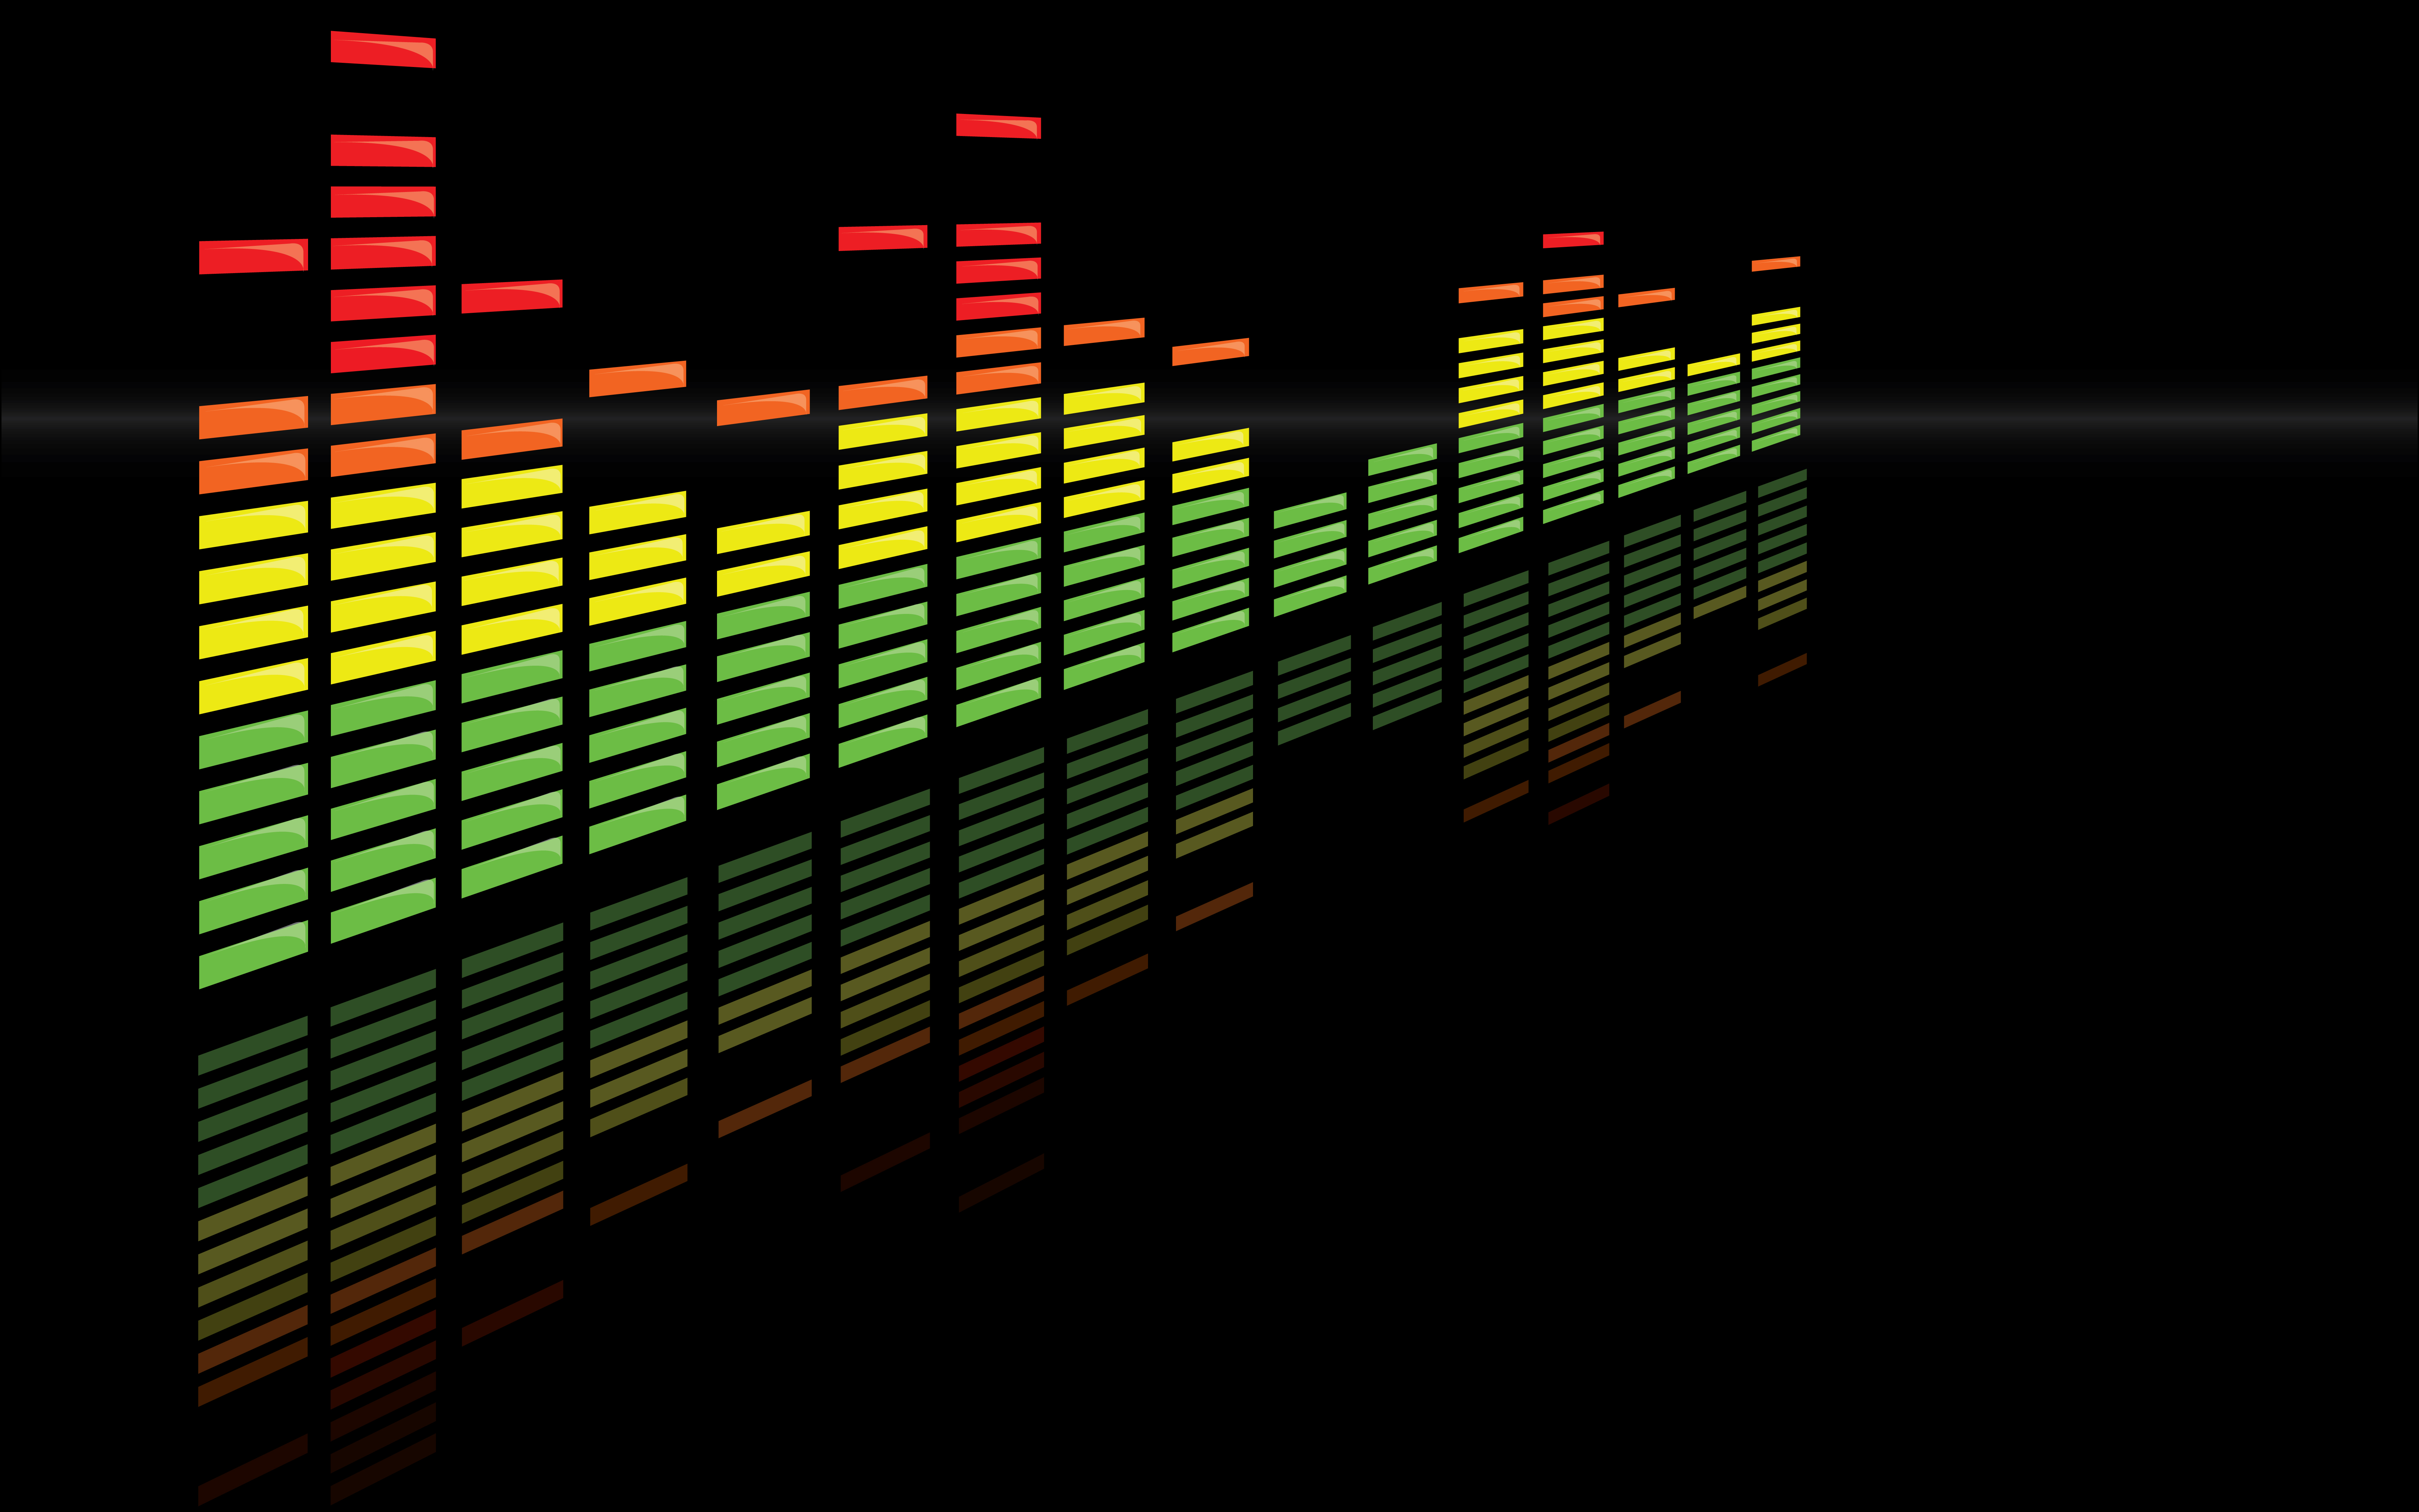 Popular Wallpaper Music Computer - GXr4q2  Best Photo Reference_9010042.jpg